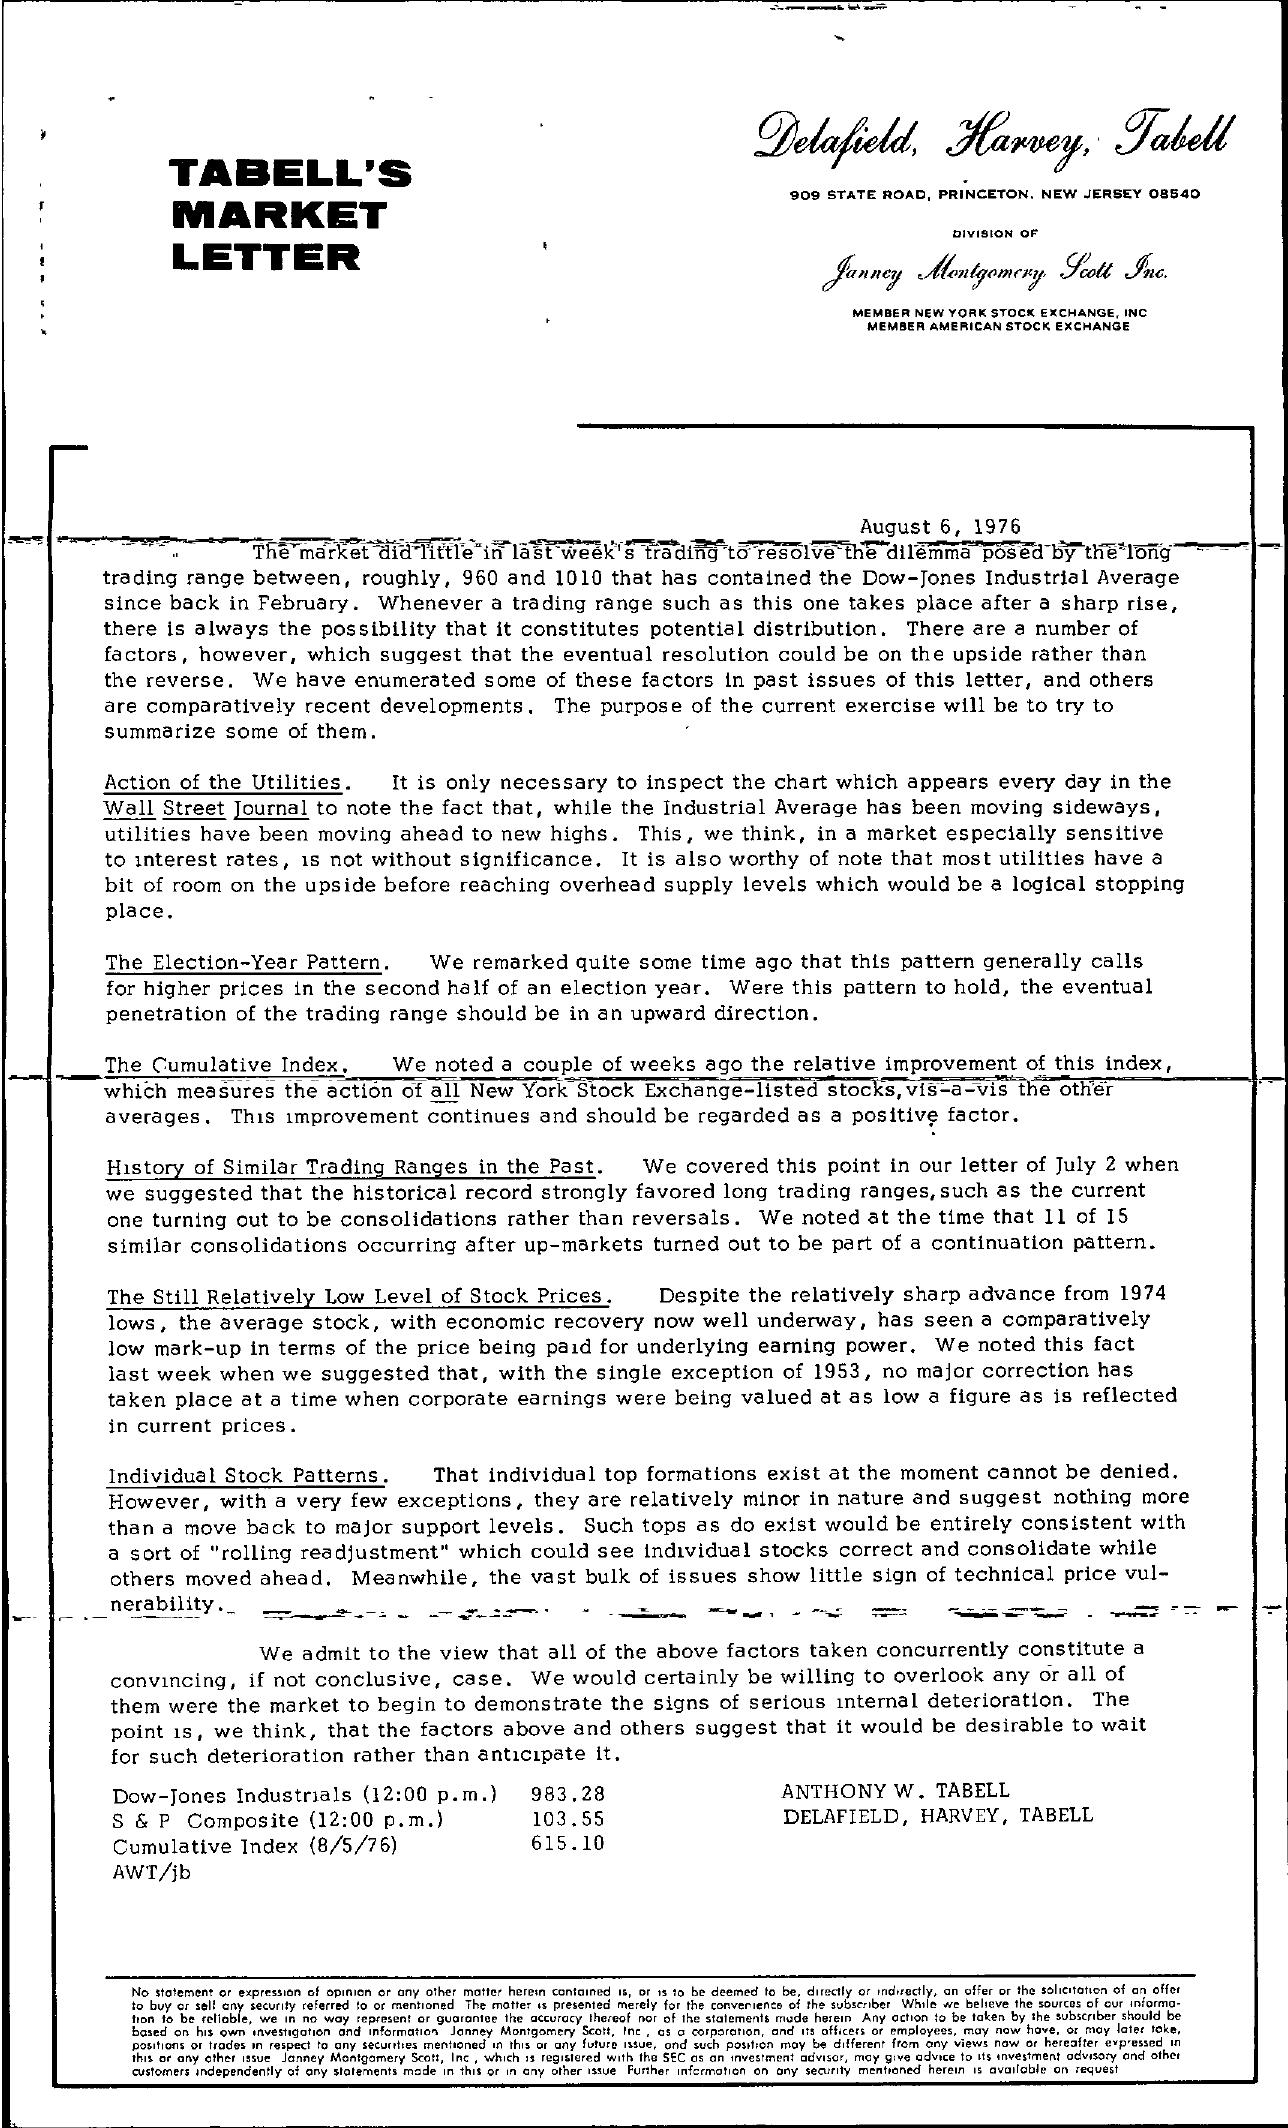 Tabell's Market Letter - August 06, 1976